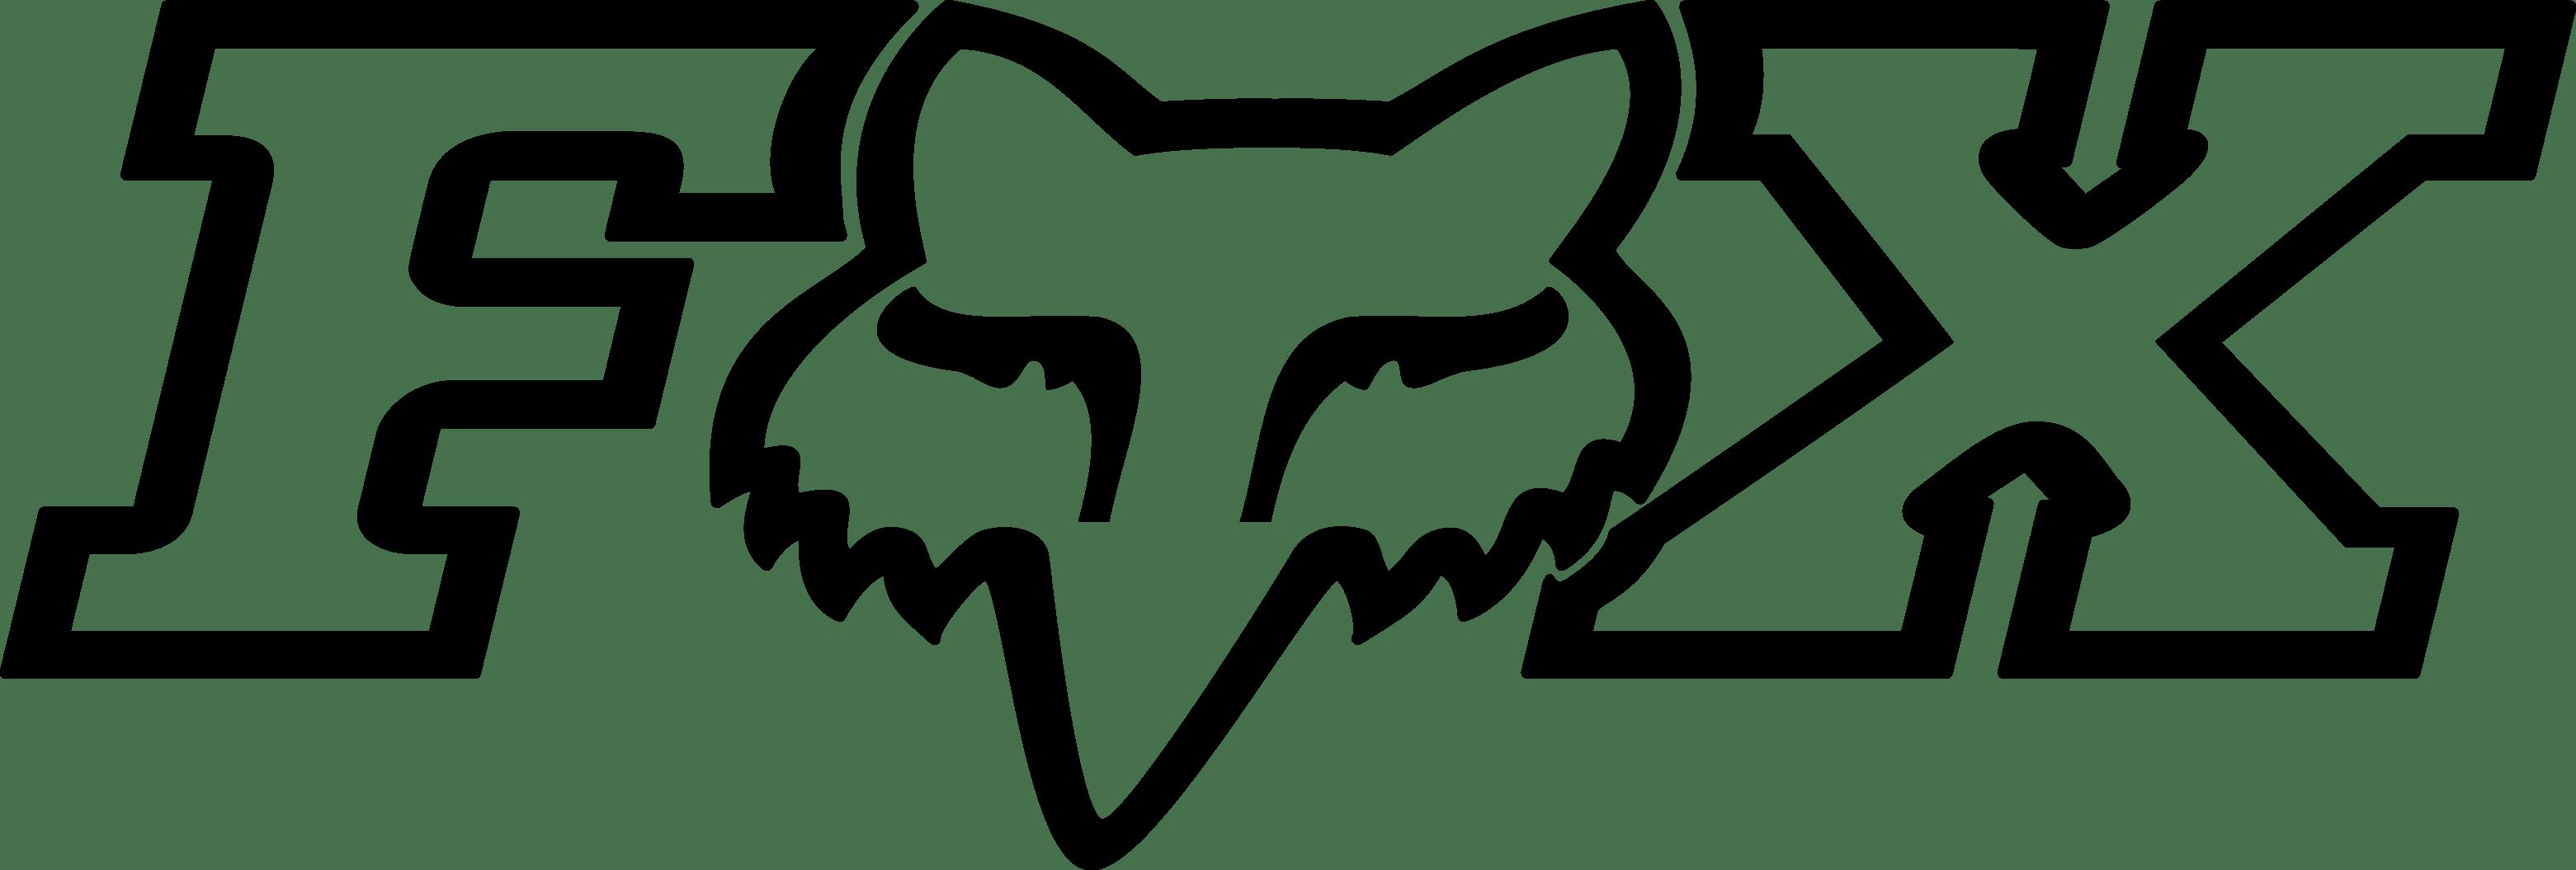 Fox racing logo vector eps free download logo icons clipart buycottarizona Gallery